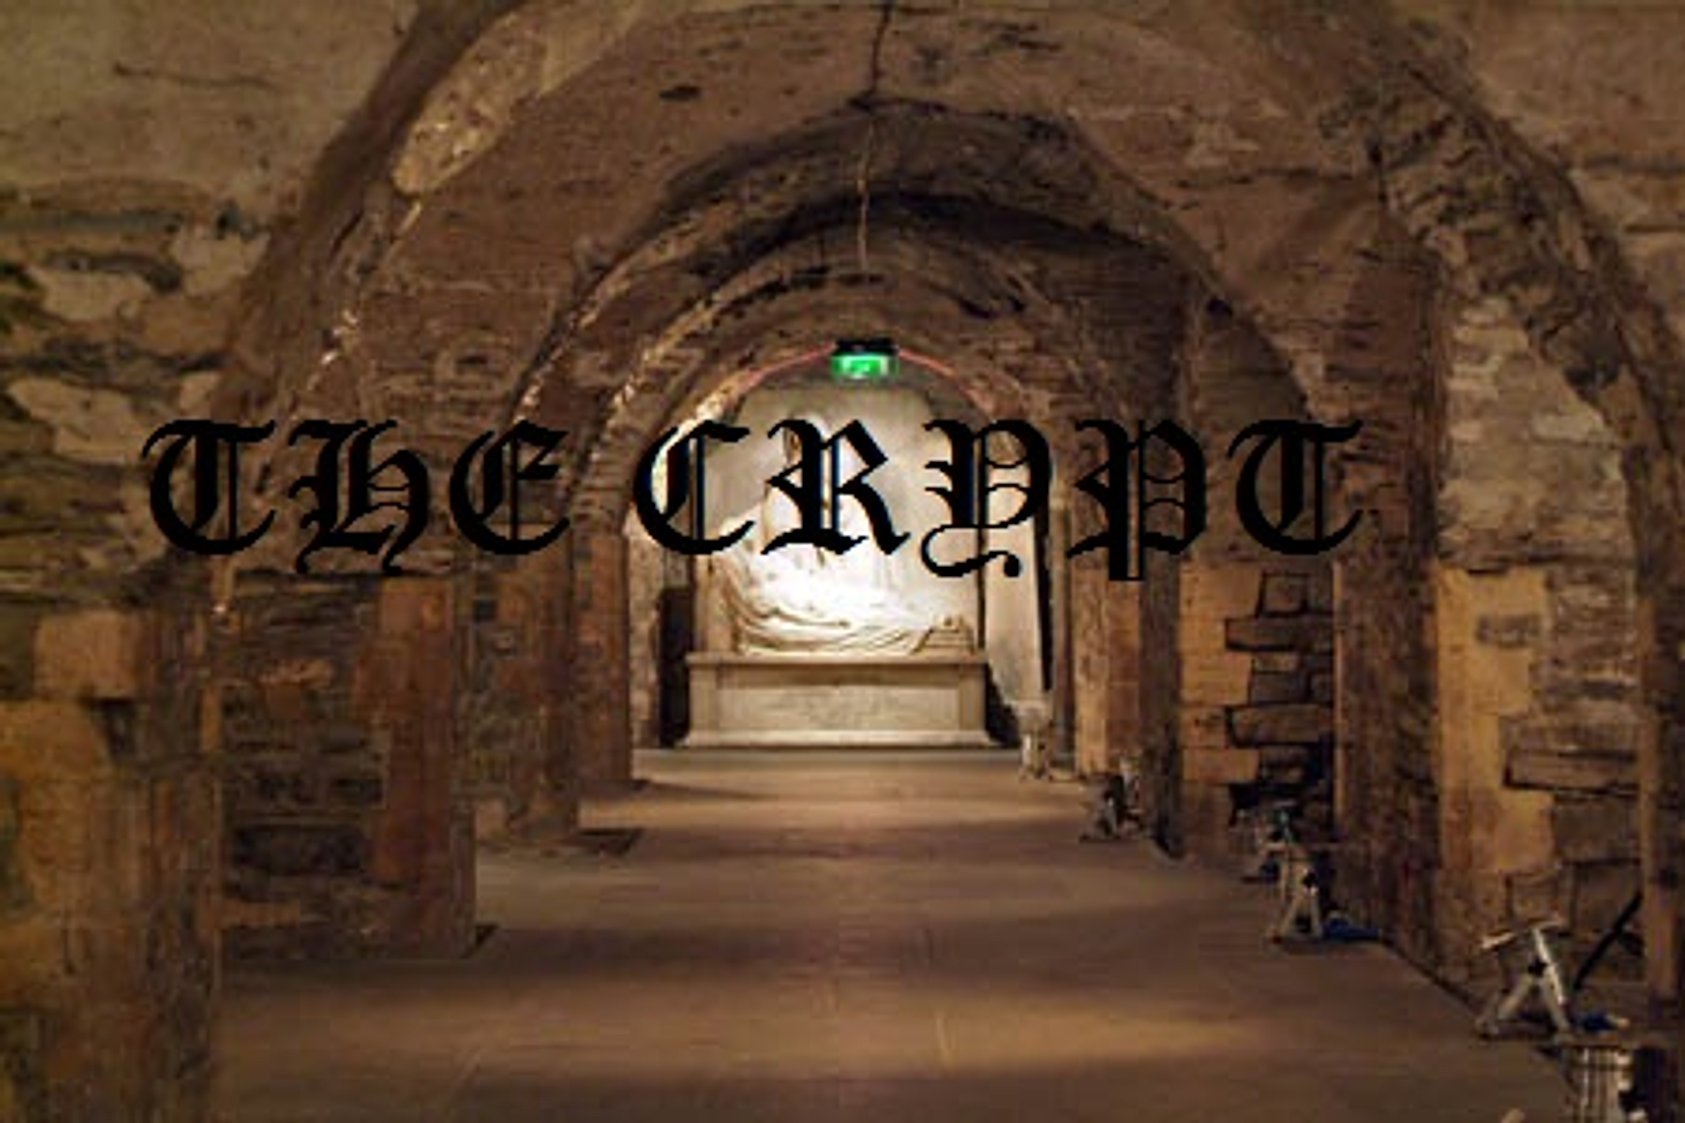 saga escapes escape room mississauga gta. Black Bedroom Furniture Sets. Home Design Ideas